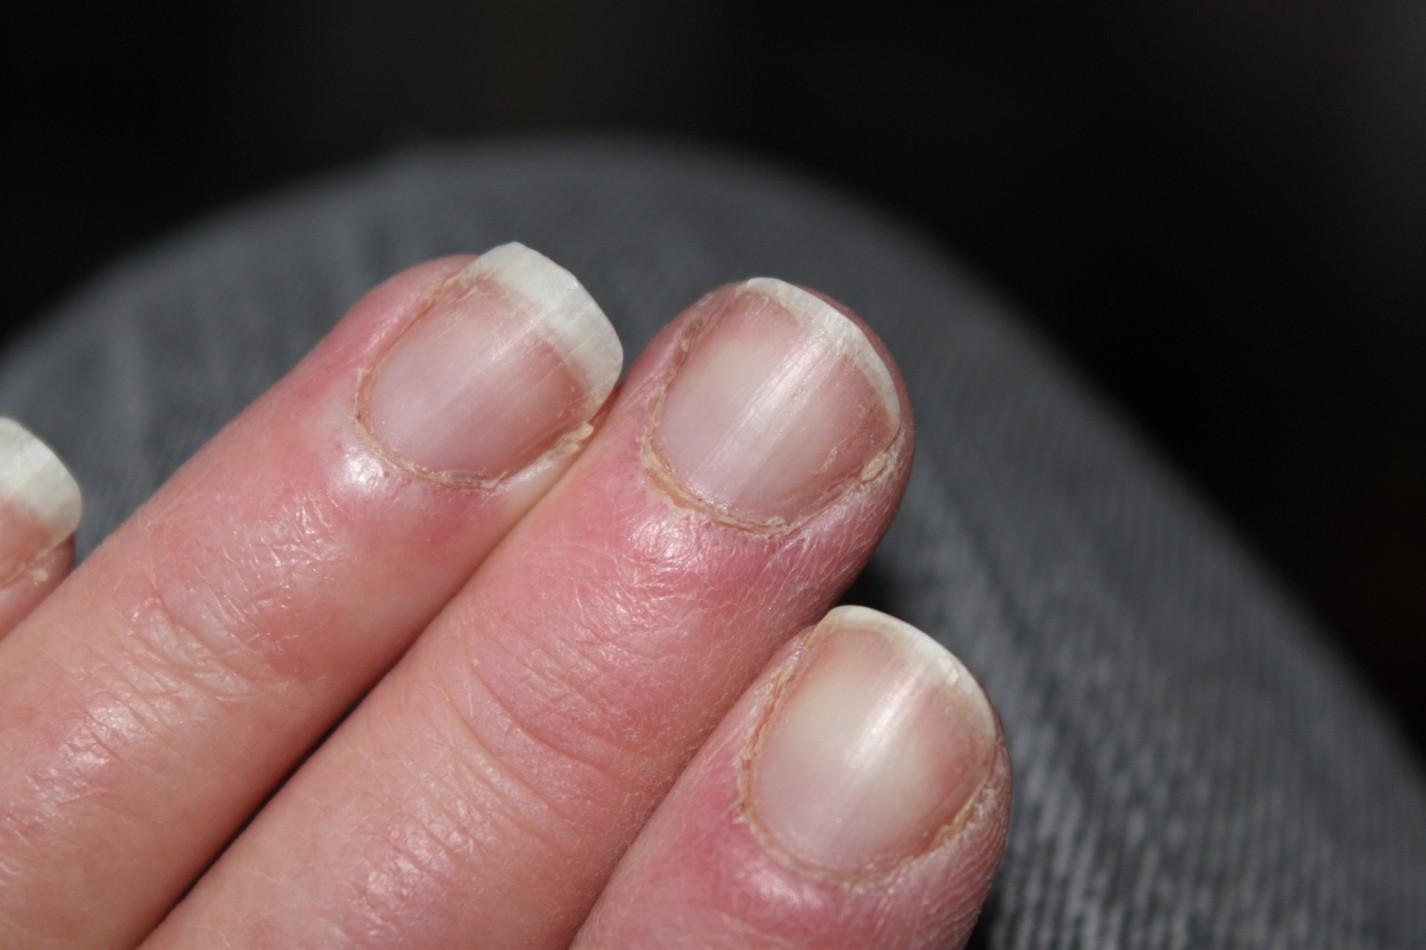 Toe Nail Peeling From Cuticle - Nails Gallery